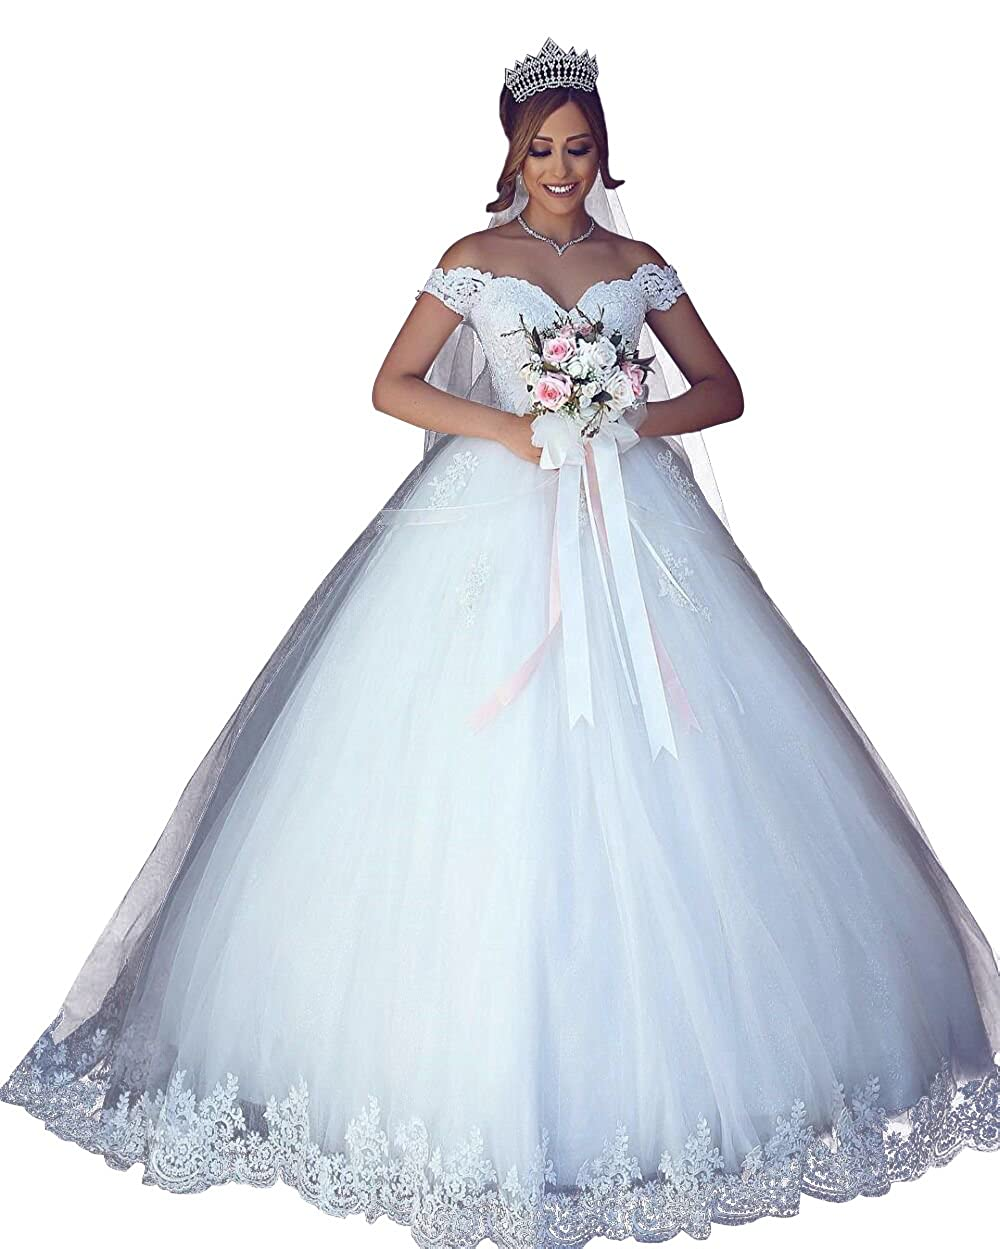 Vinbridal 2018 Off Shoulder Ball Gown Wedding Dress Lace Applique